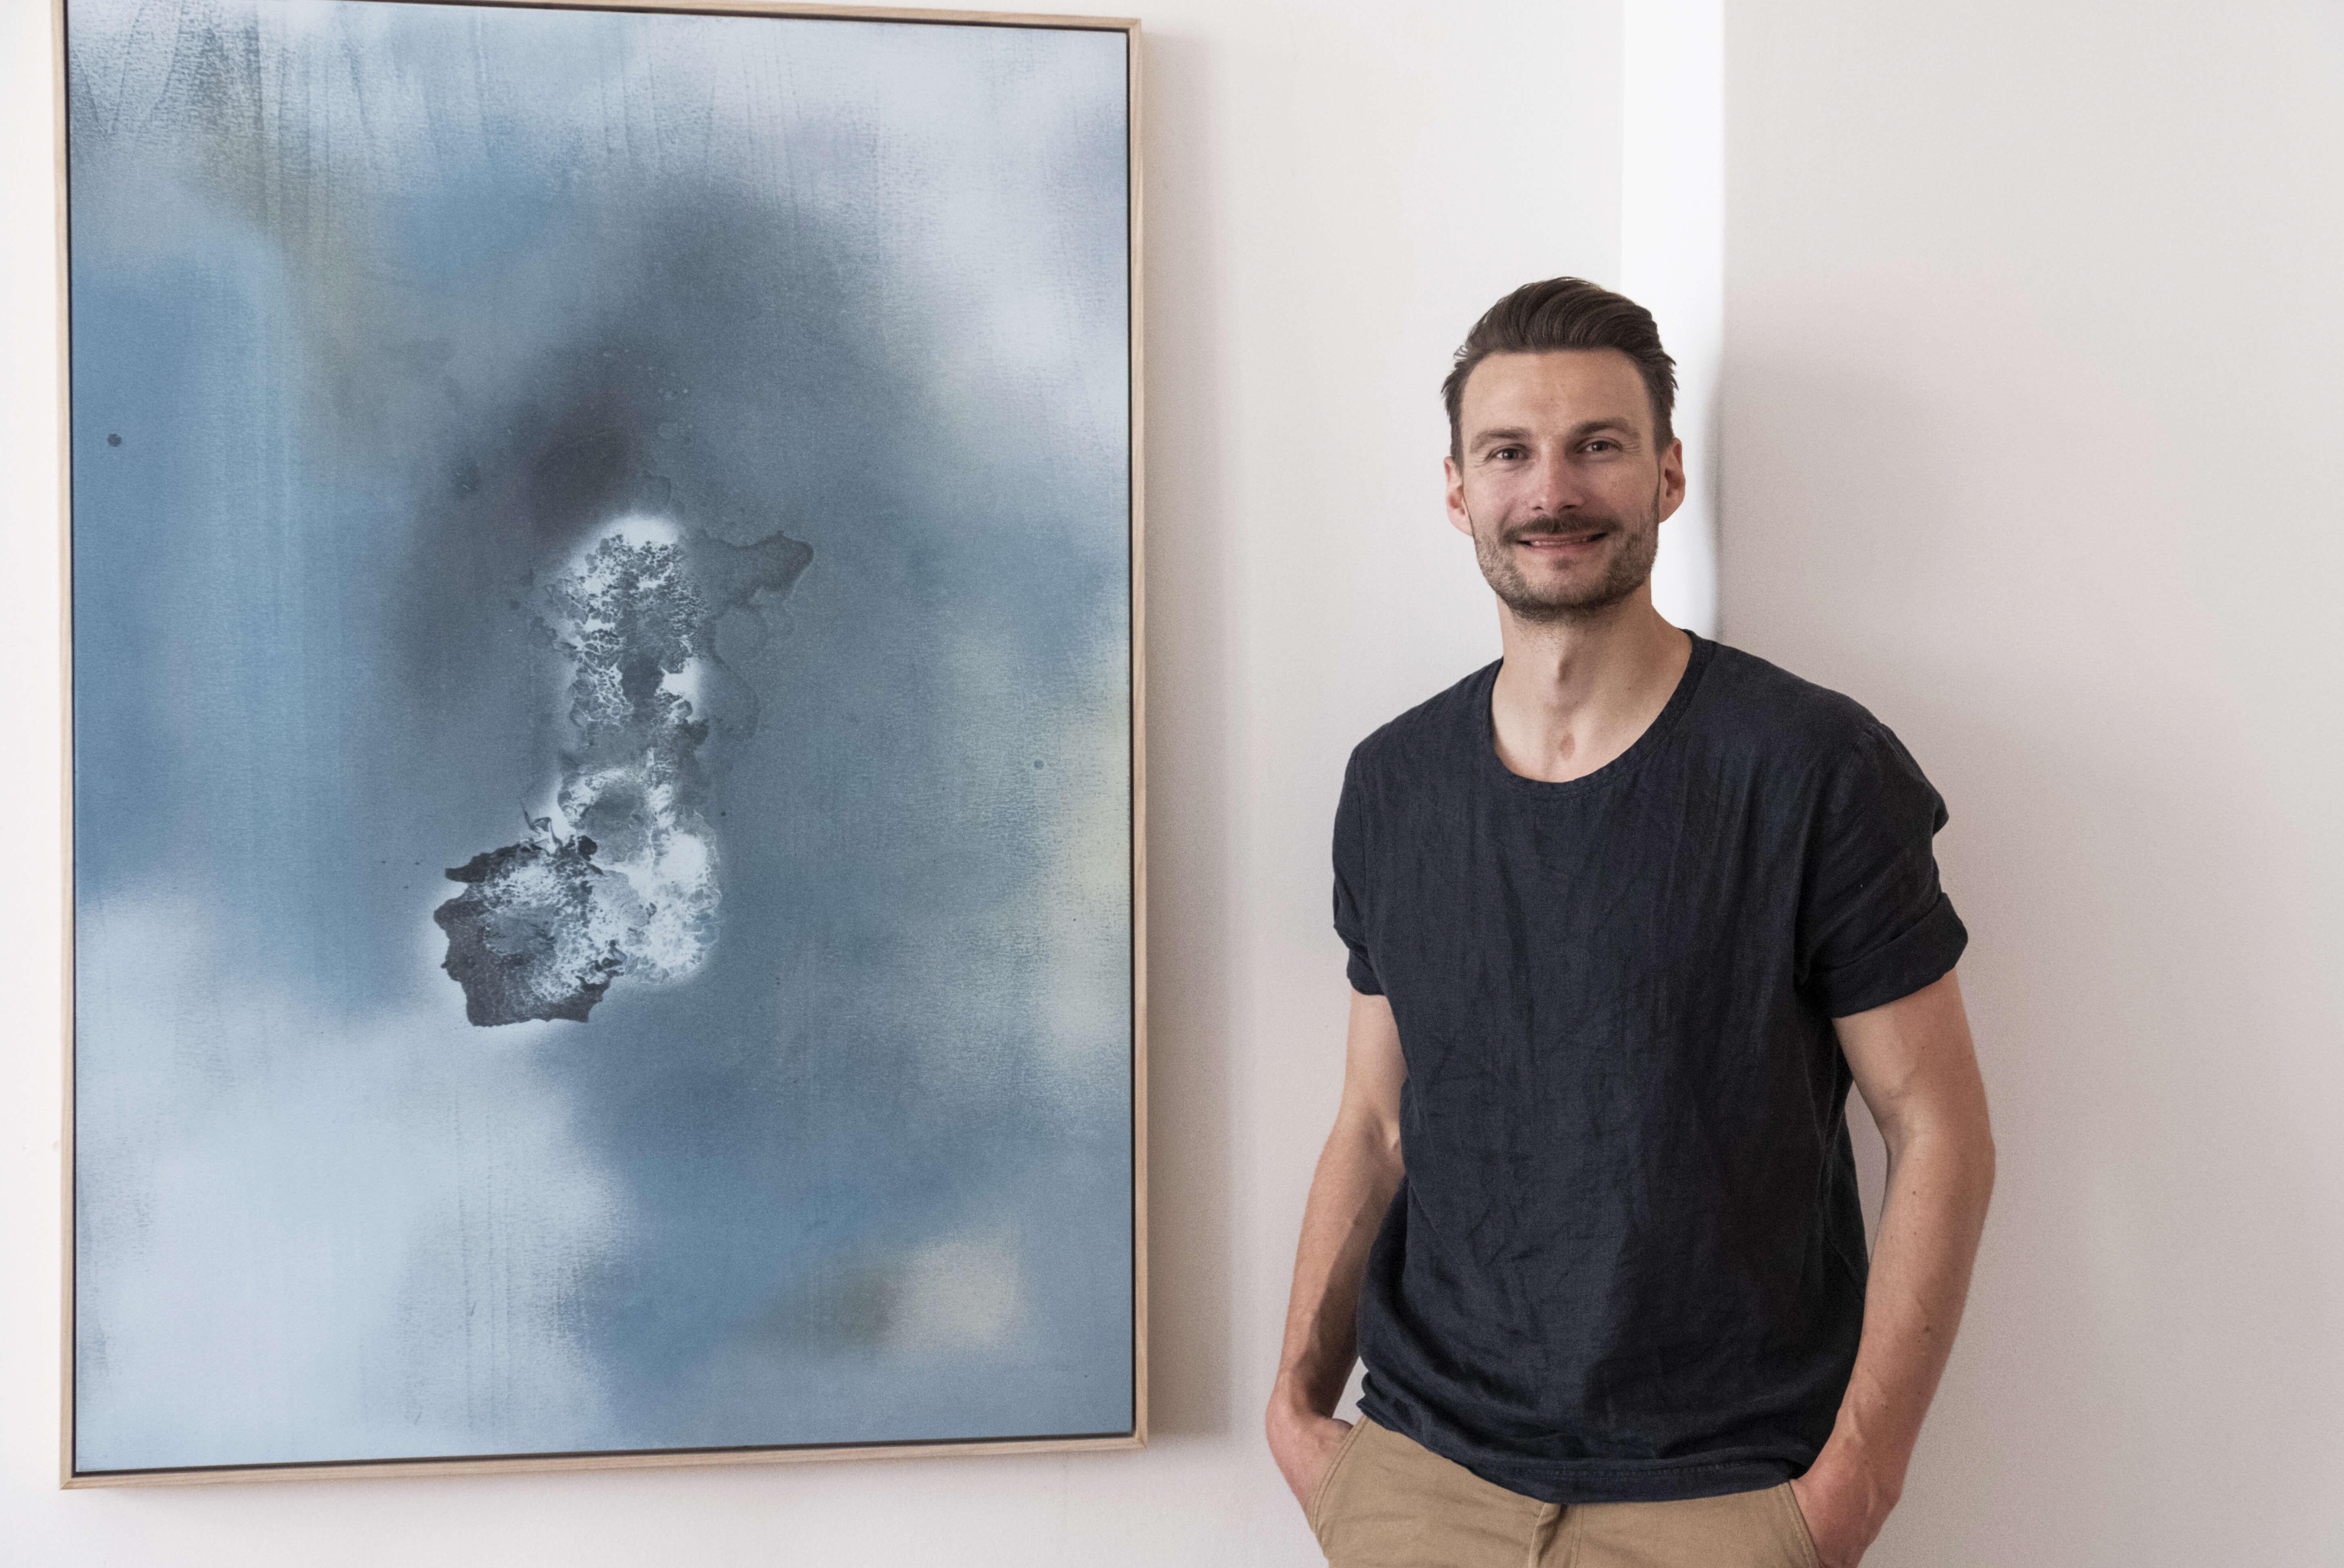 Künstler Felix Schulze vor Gemälde